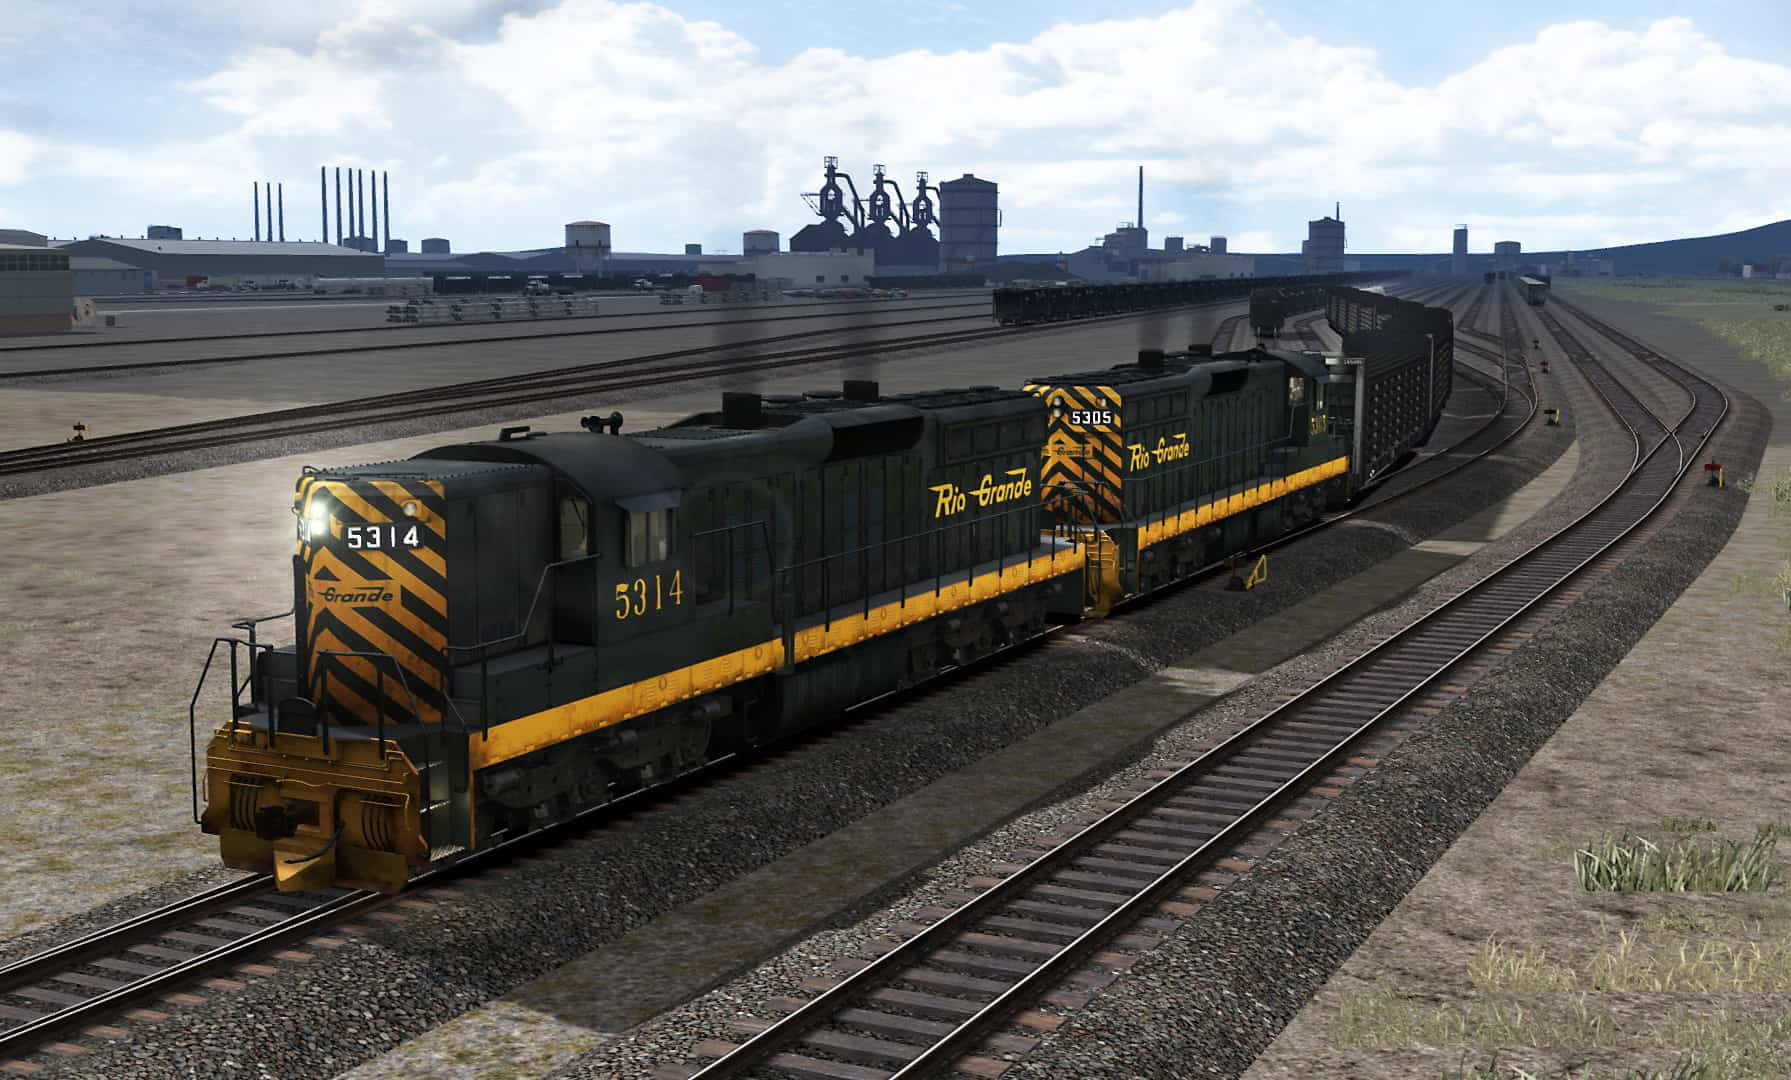 SPR-07